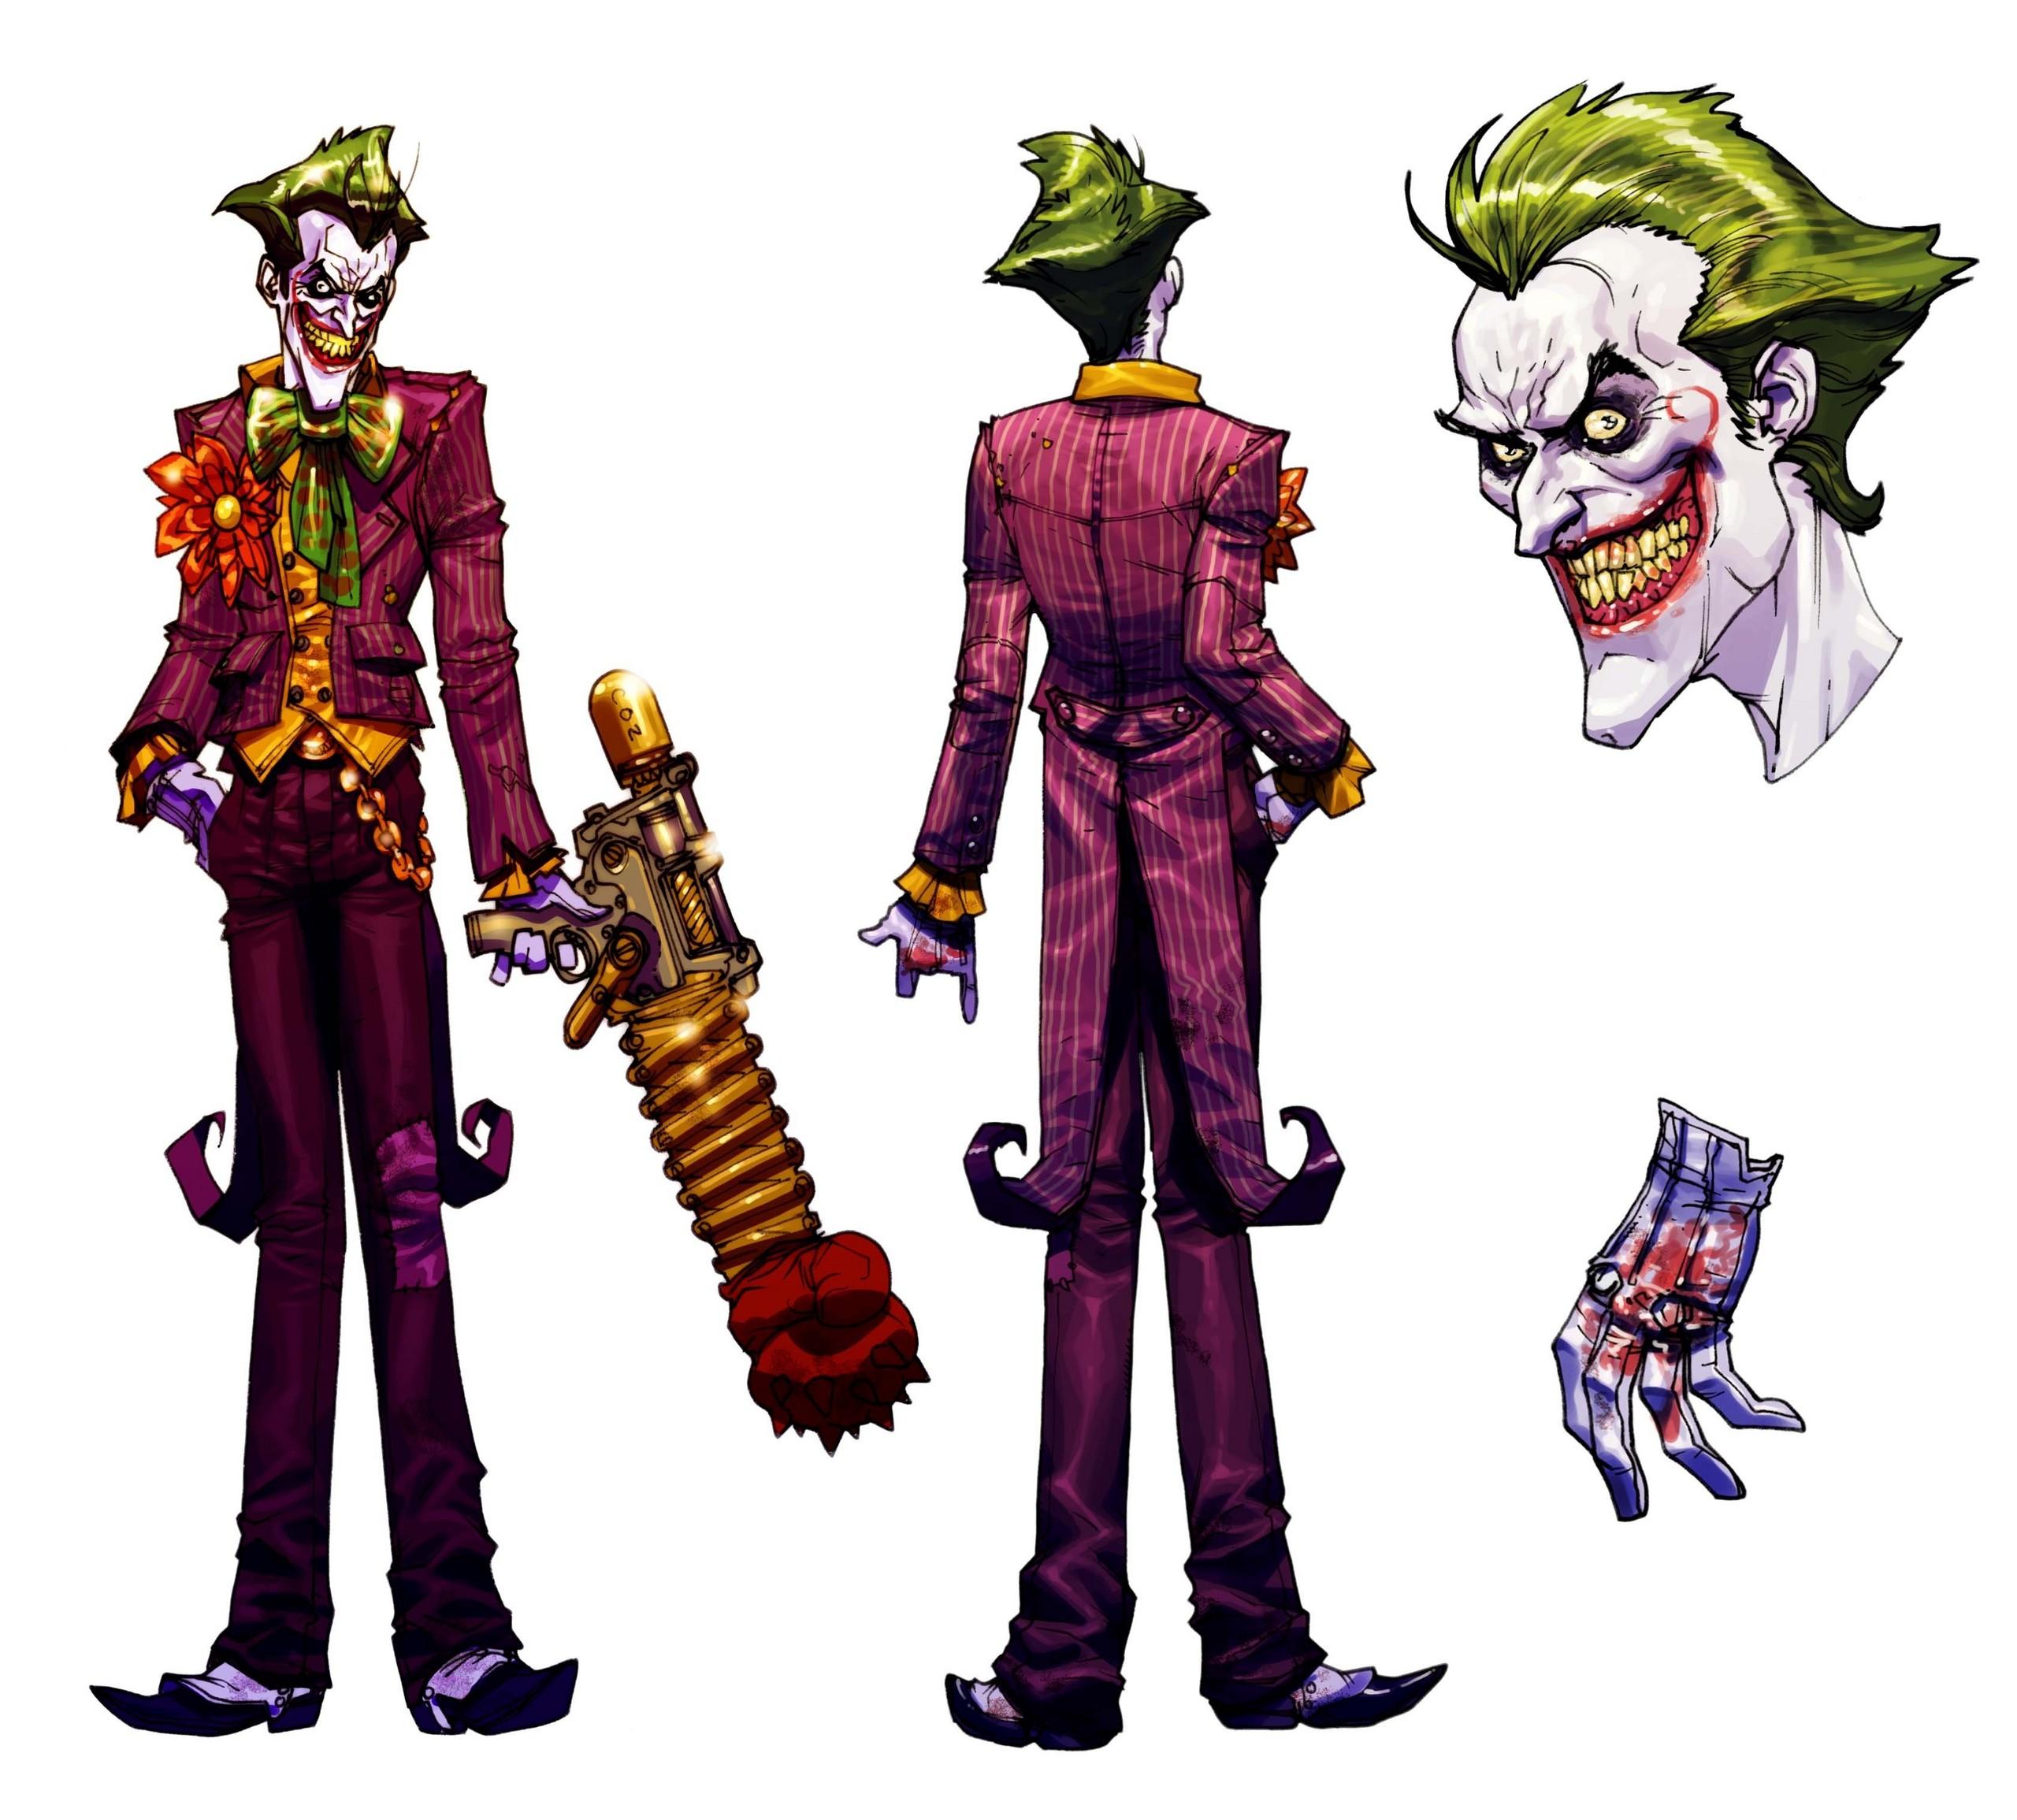 Batman Arkham Asylum Images Joker HD Fond Dcran And